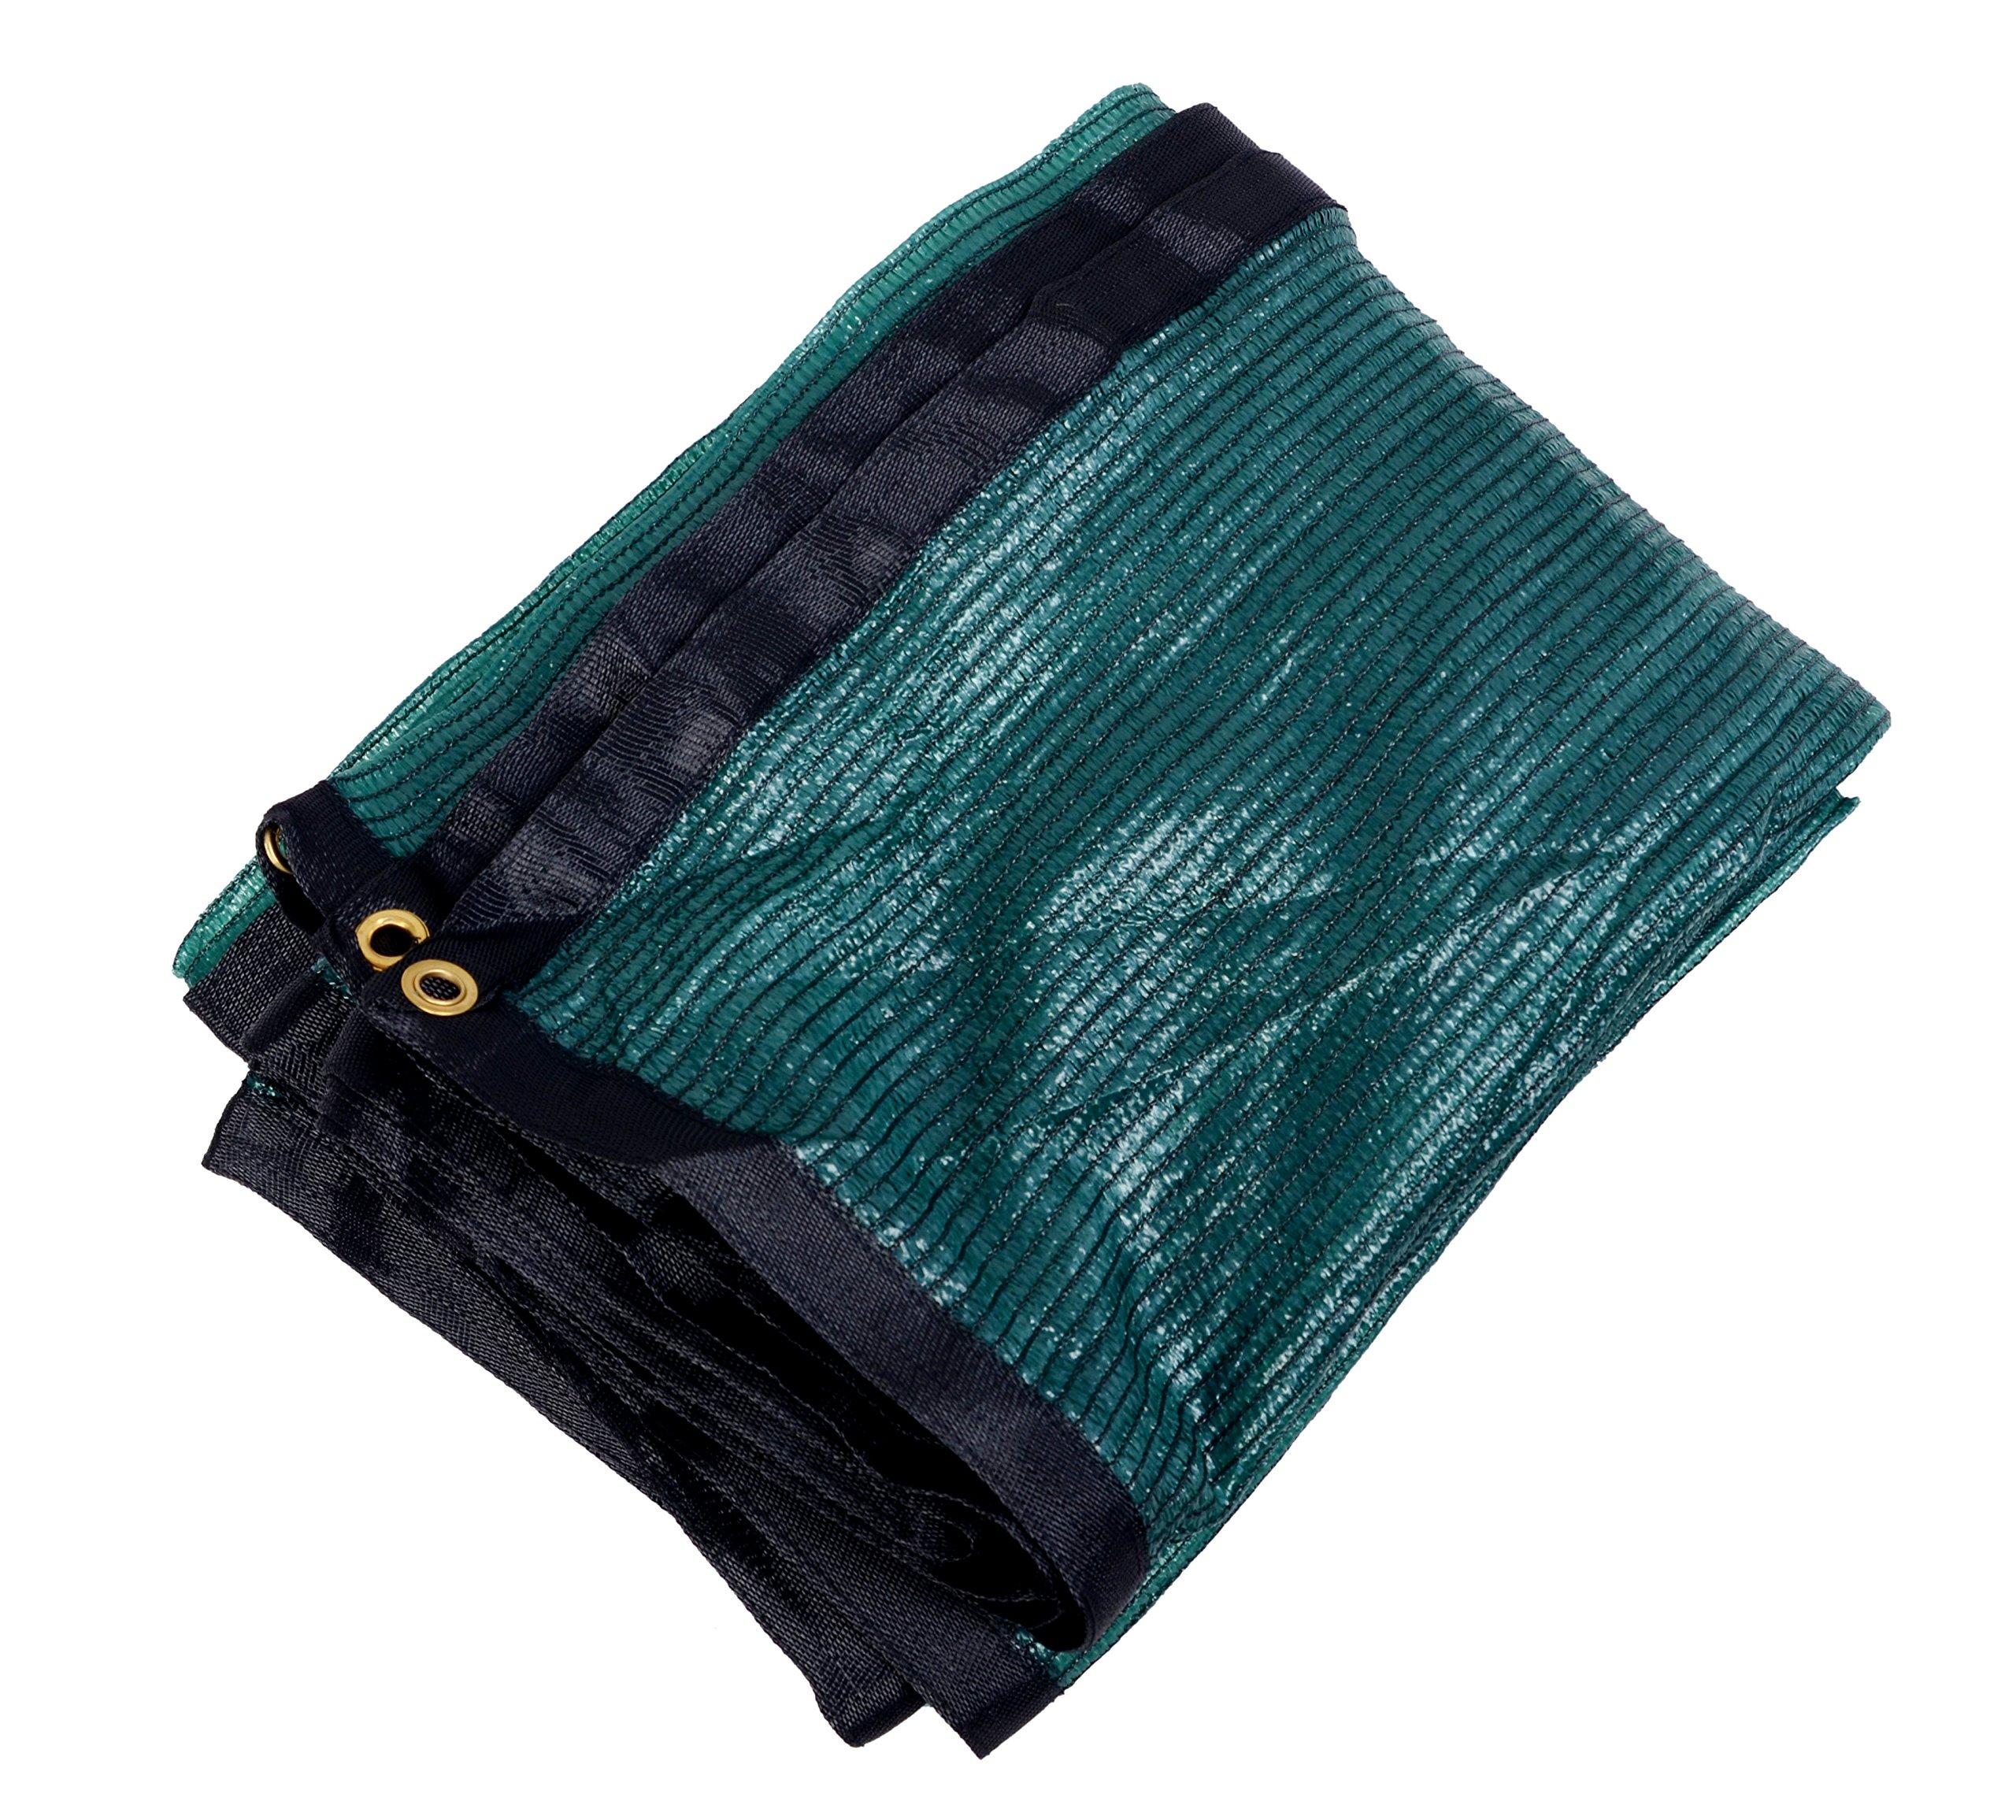 YGS 40% Green 12 ft x 36 ft Shade Cloth UV Resistant Net for Garden Flower Plant